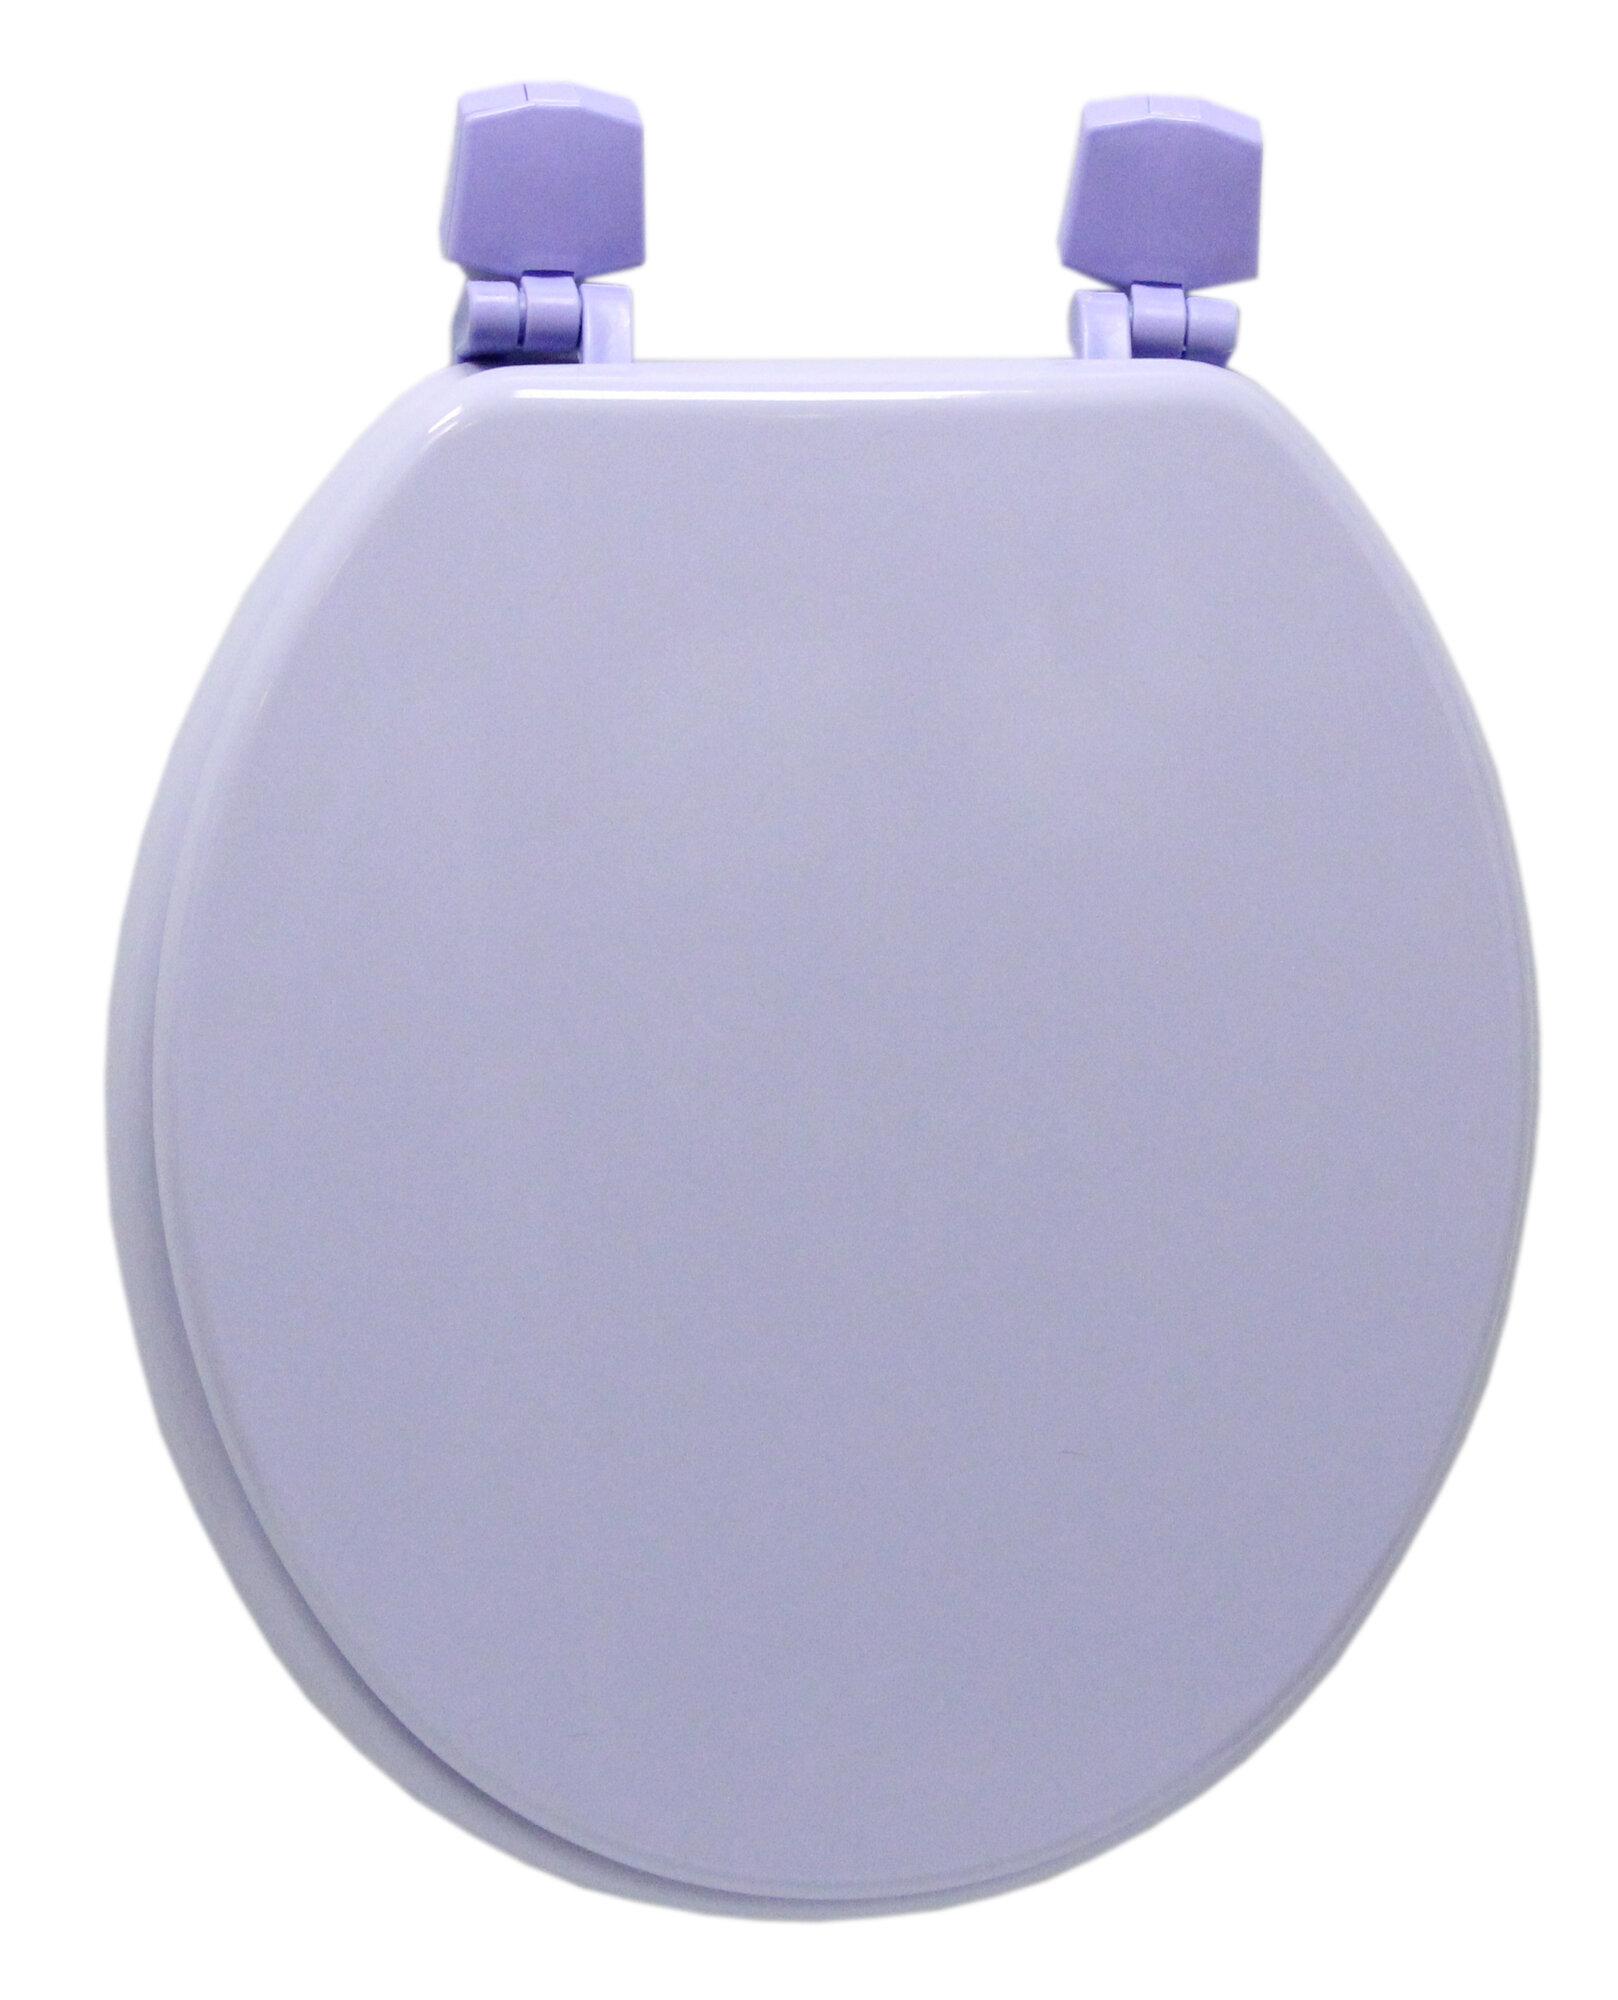 Trimmer Molded Wood Round Toilet Seat Corn Flower Purple EBay